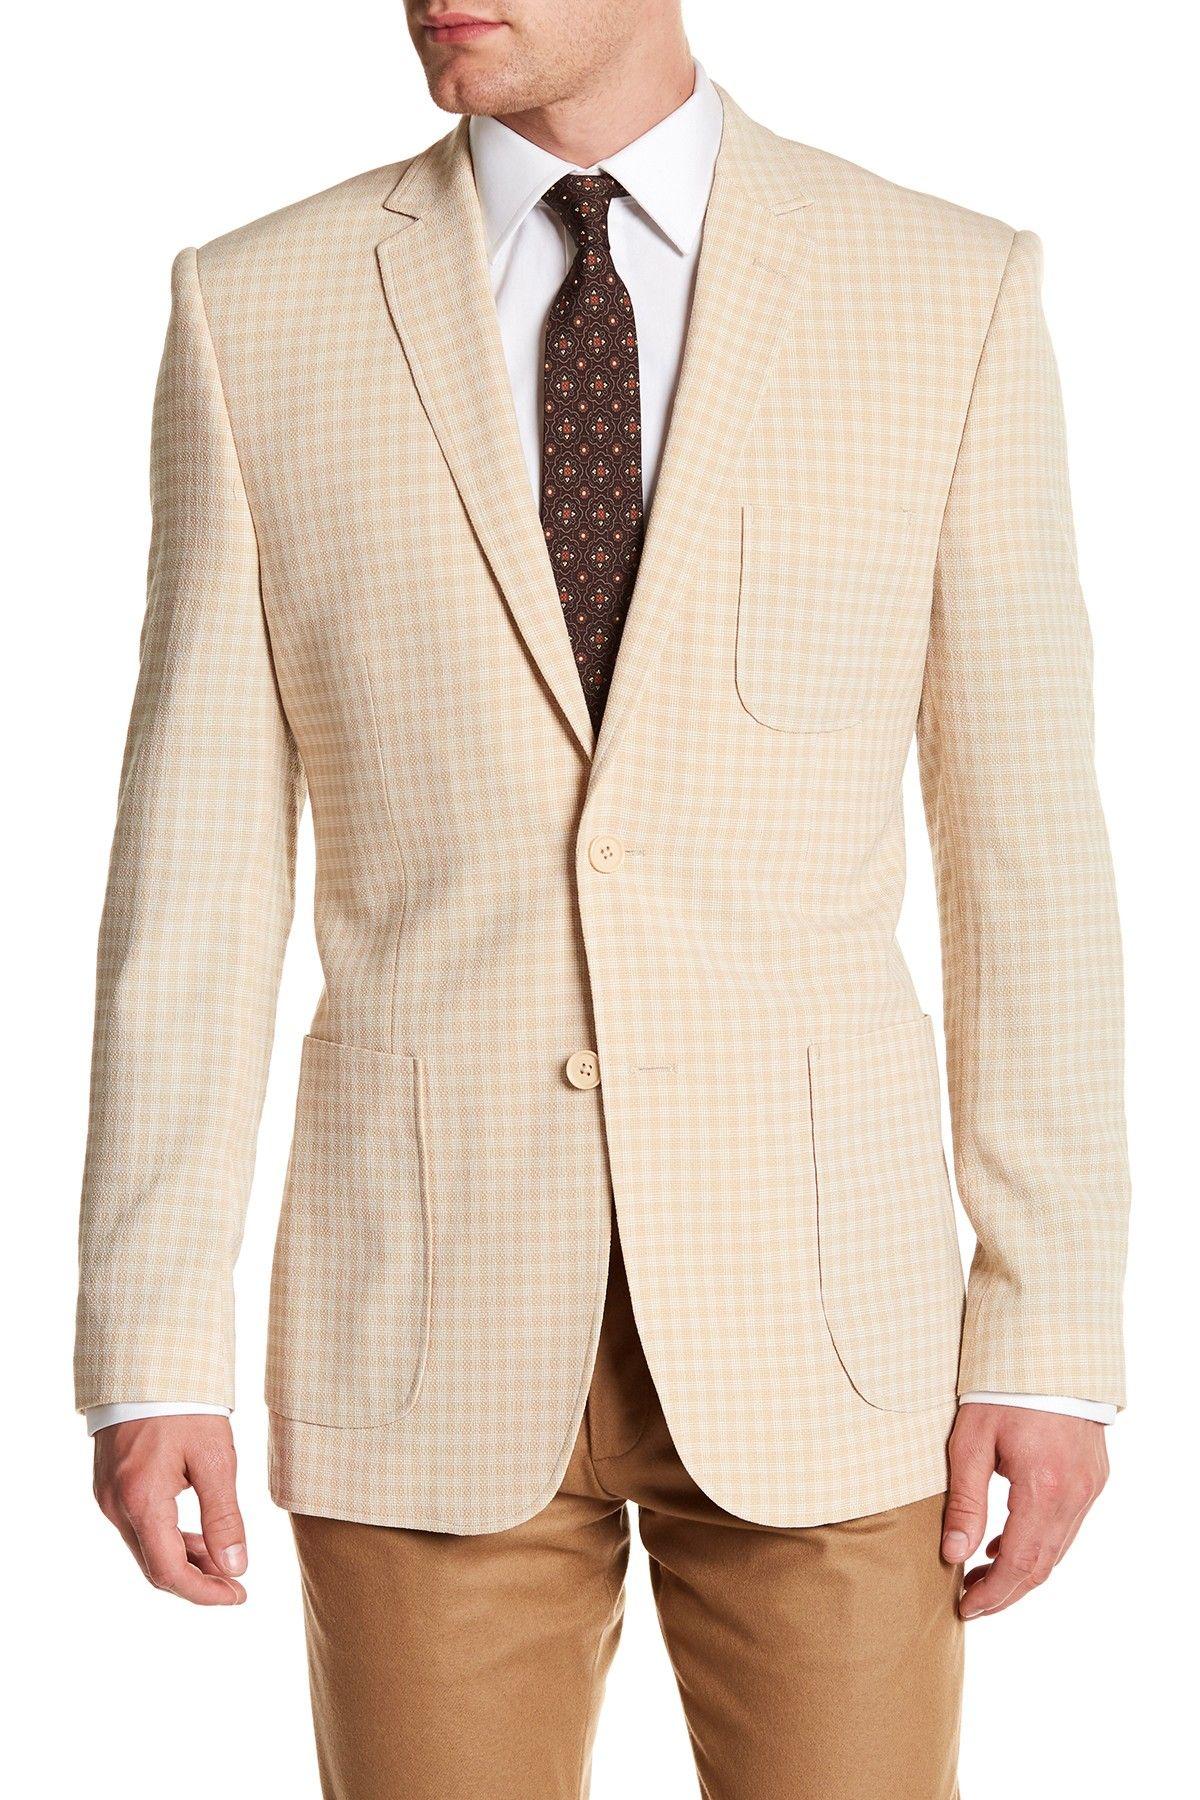 Pin On Men S Fashion [ 1800 x 1200 Pixel ]